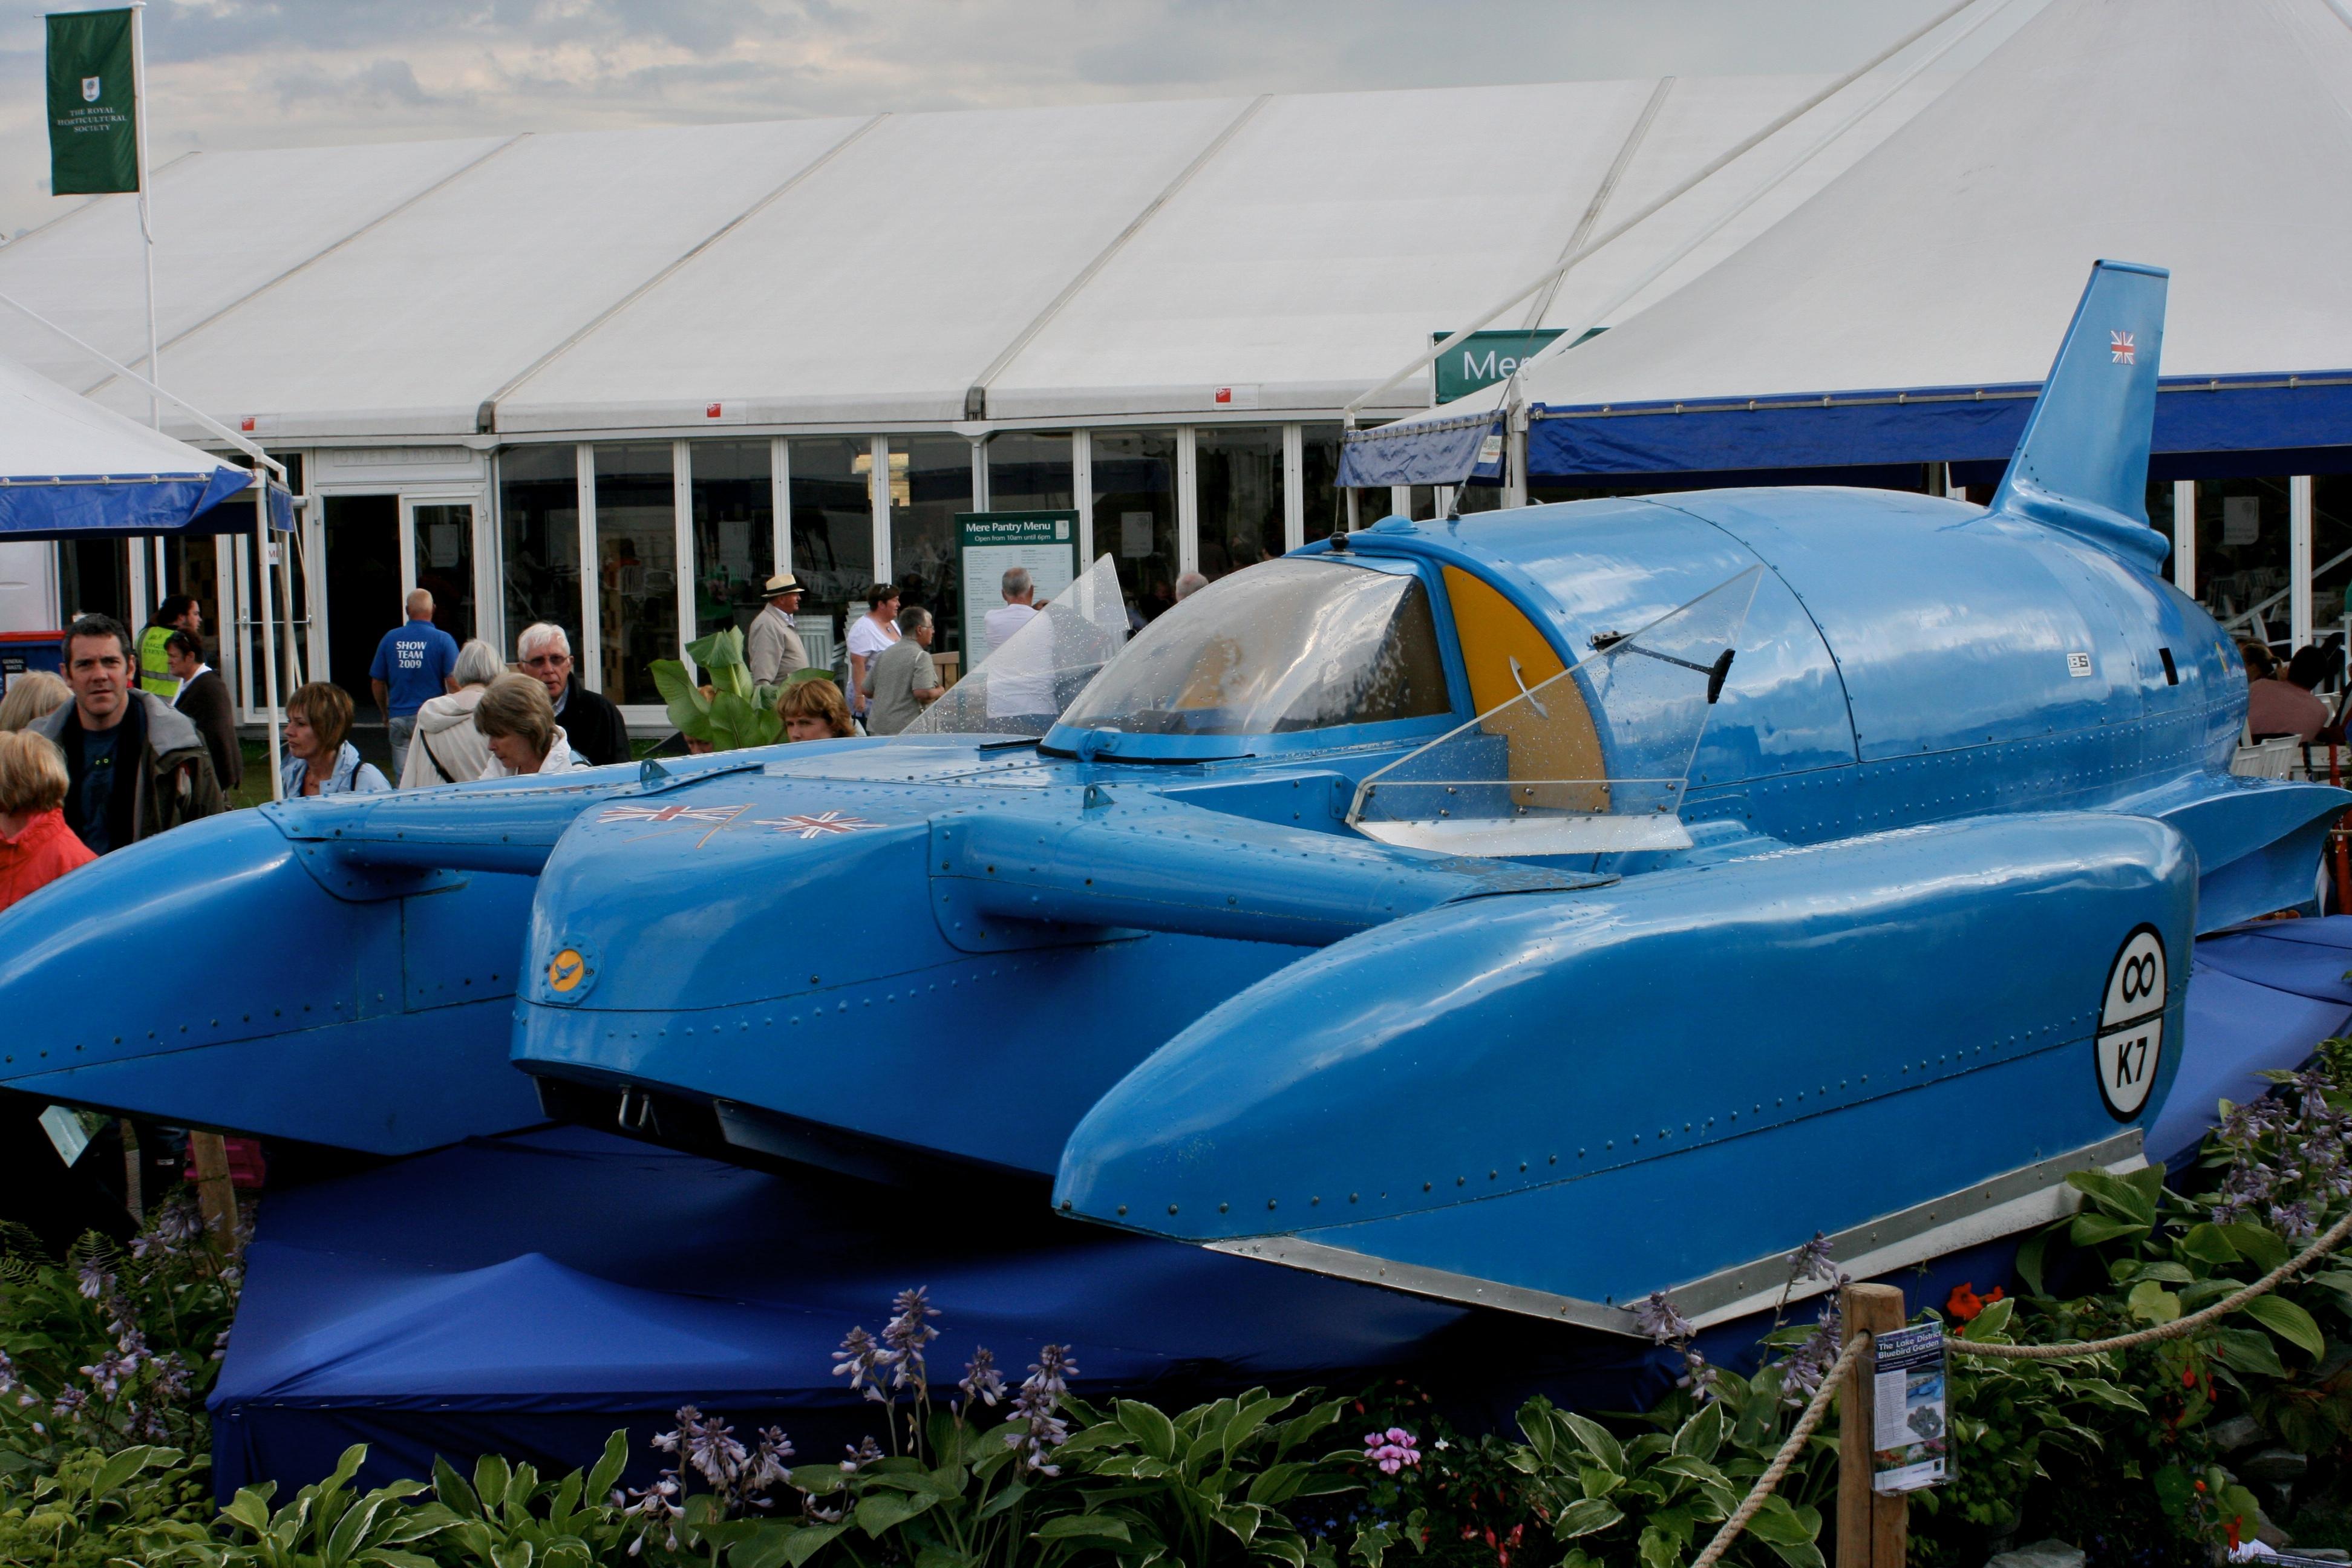 Car Racing Boat Plane And Car